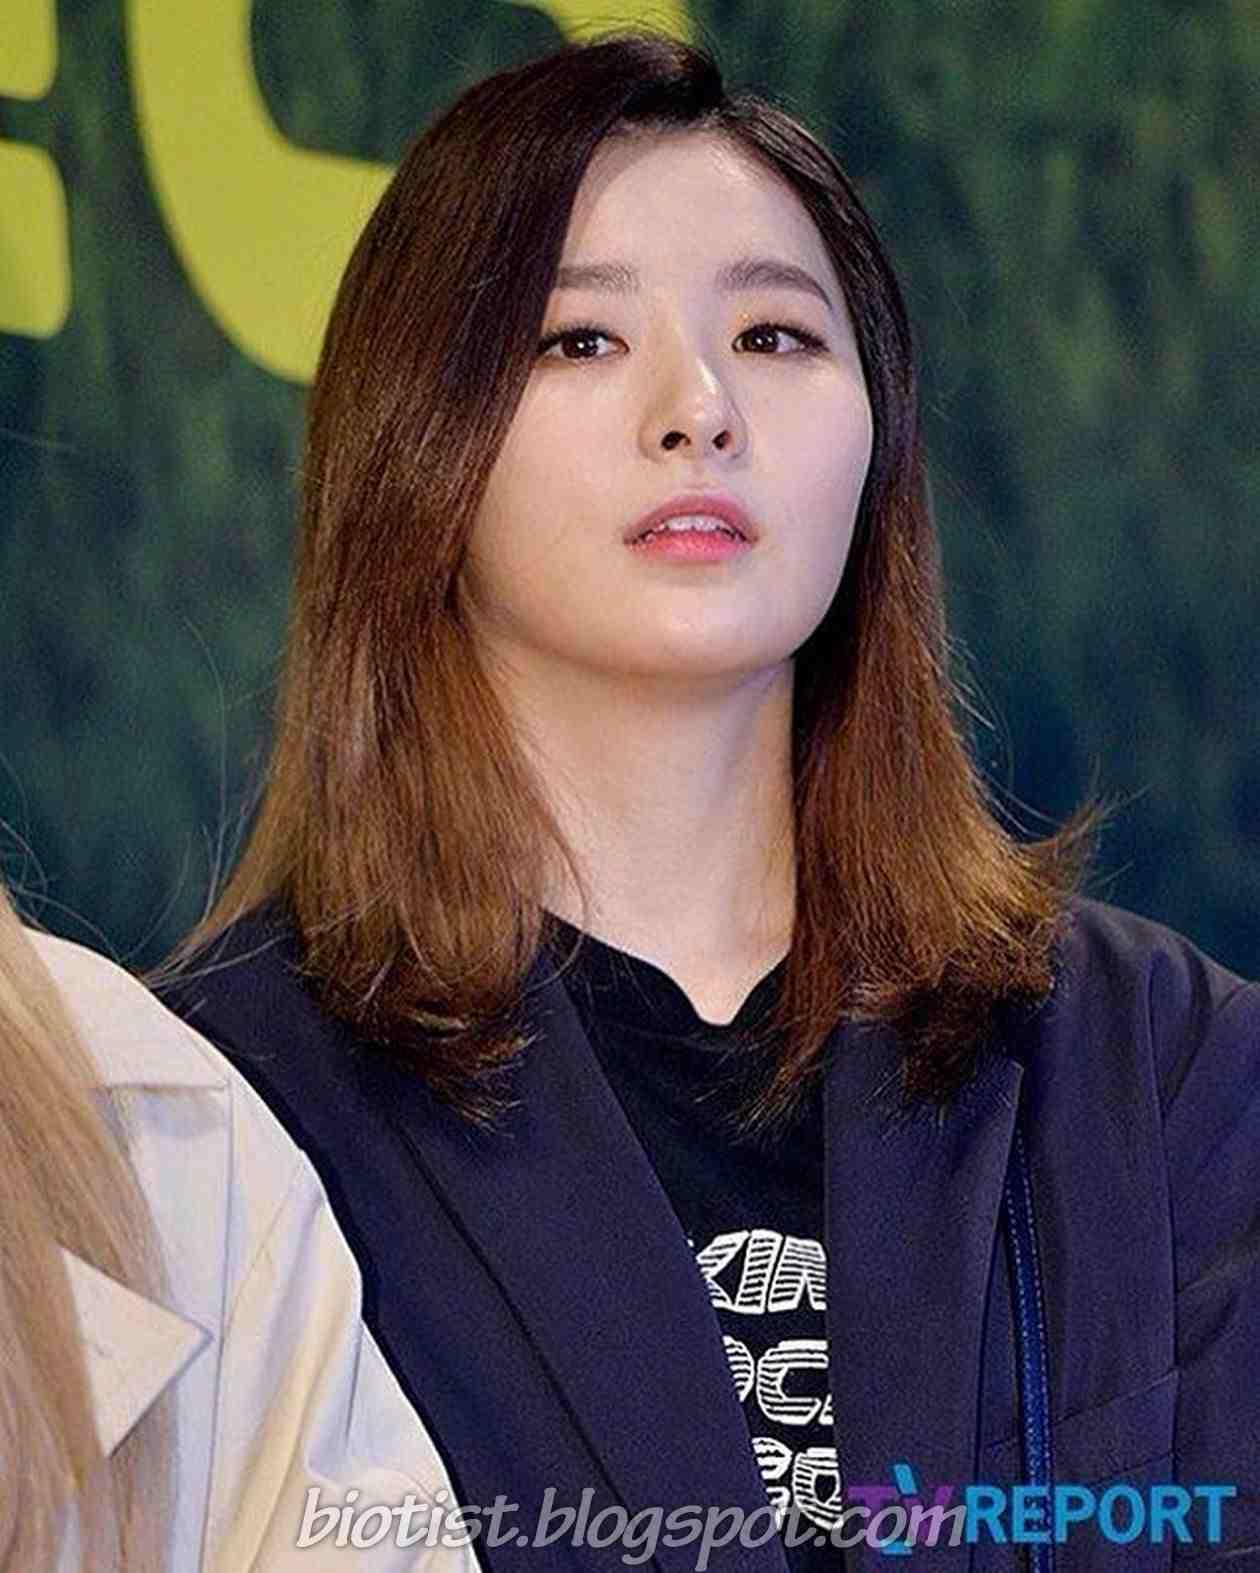 Seulgi Red Velvet Profile, Photos, Fact, Bio and More   Biotist